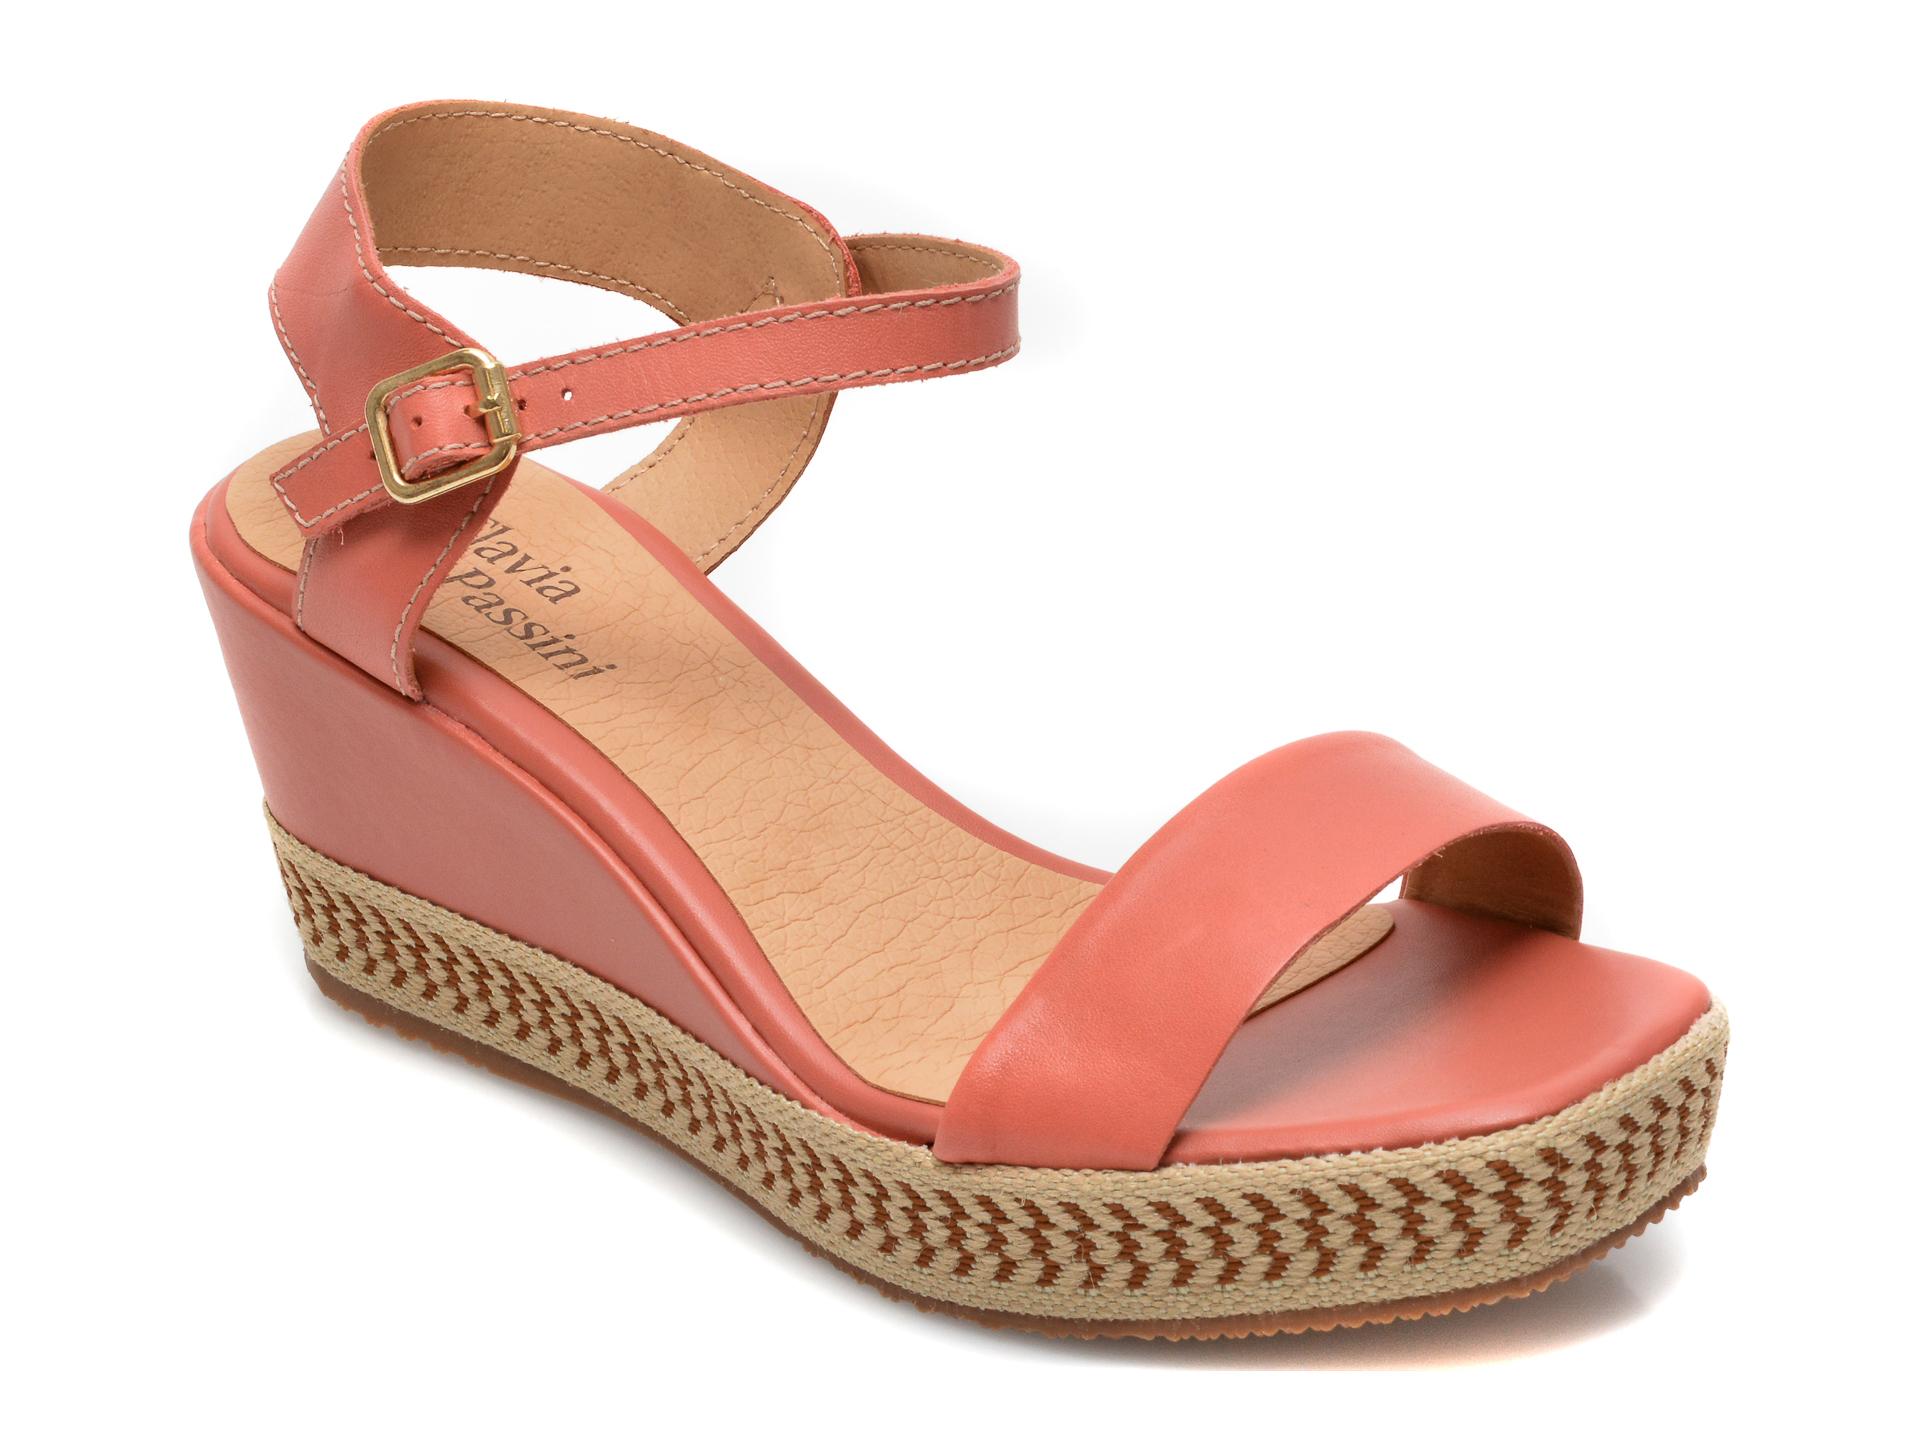 Sandale FLAVIA PASSINI roz, 322003, din piele naturala imagine otter.ro